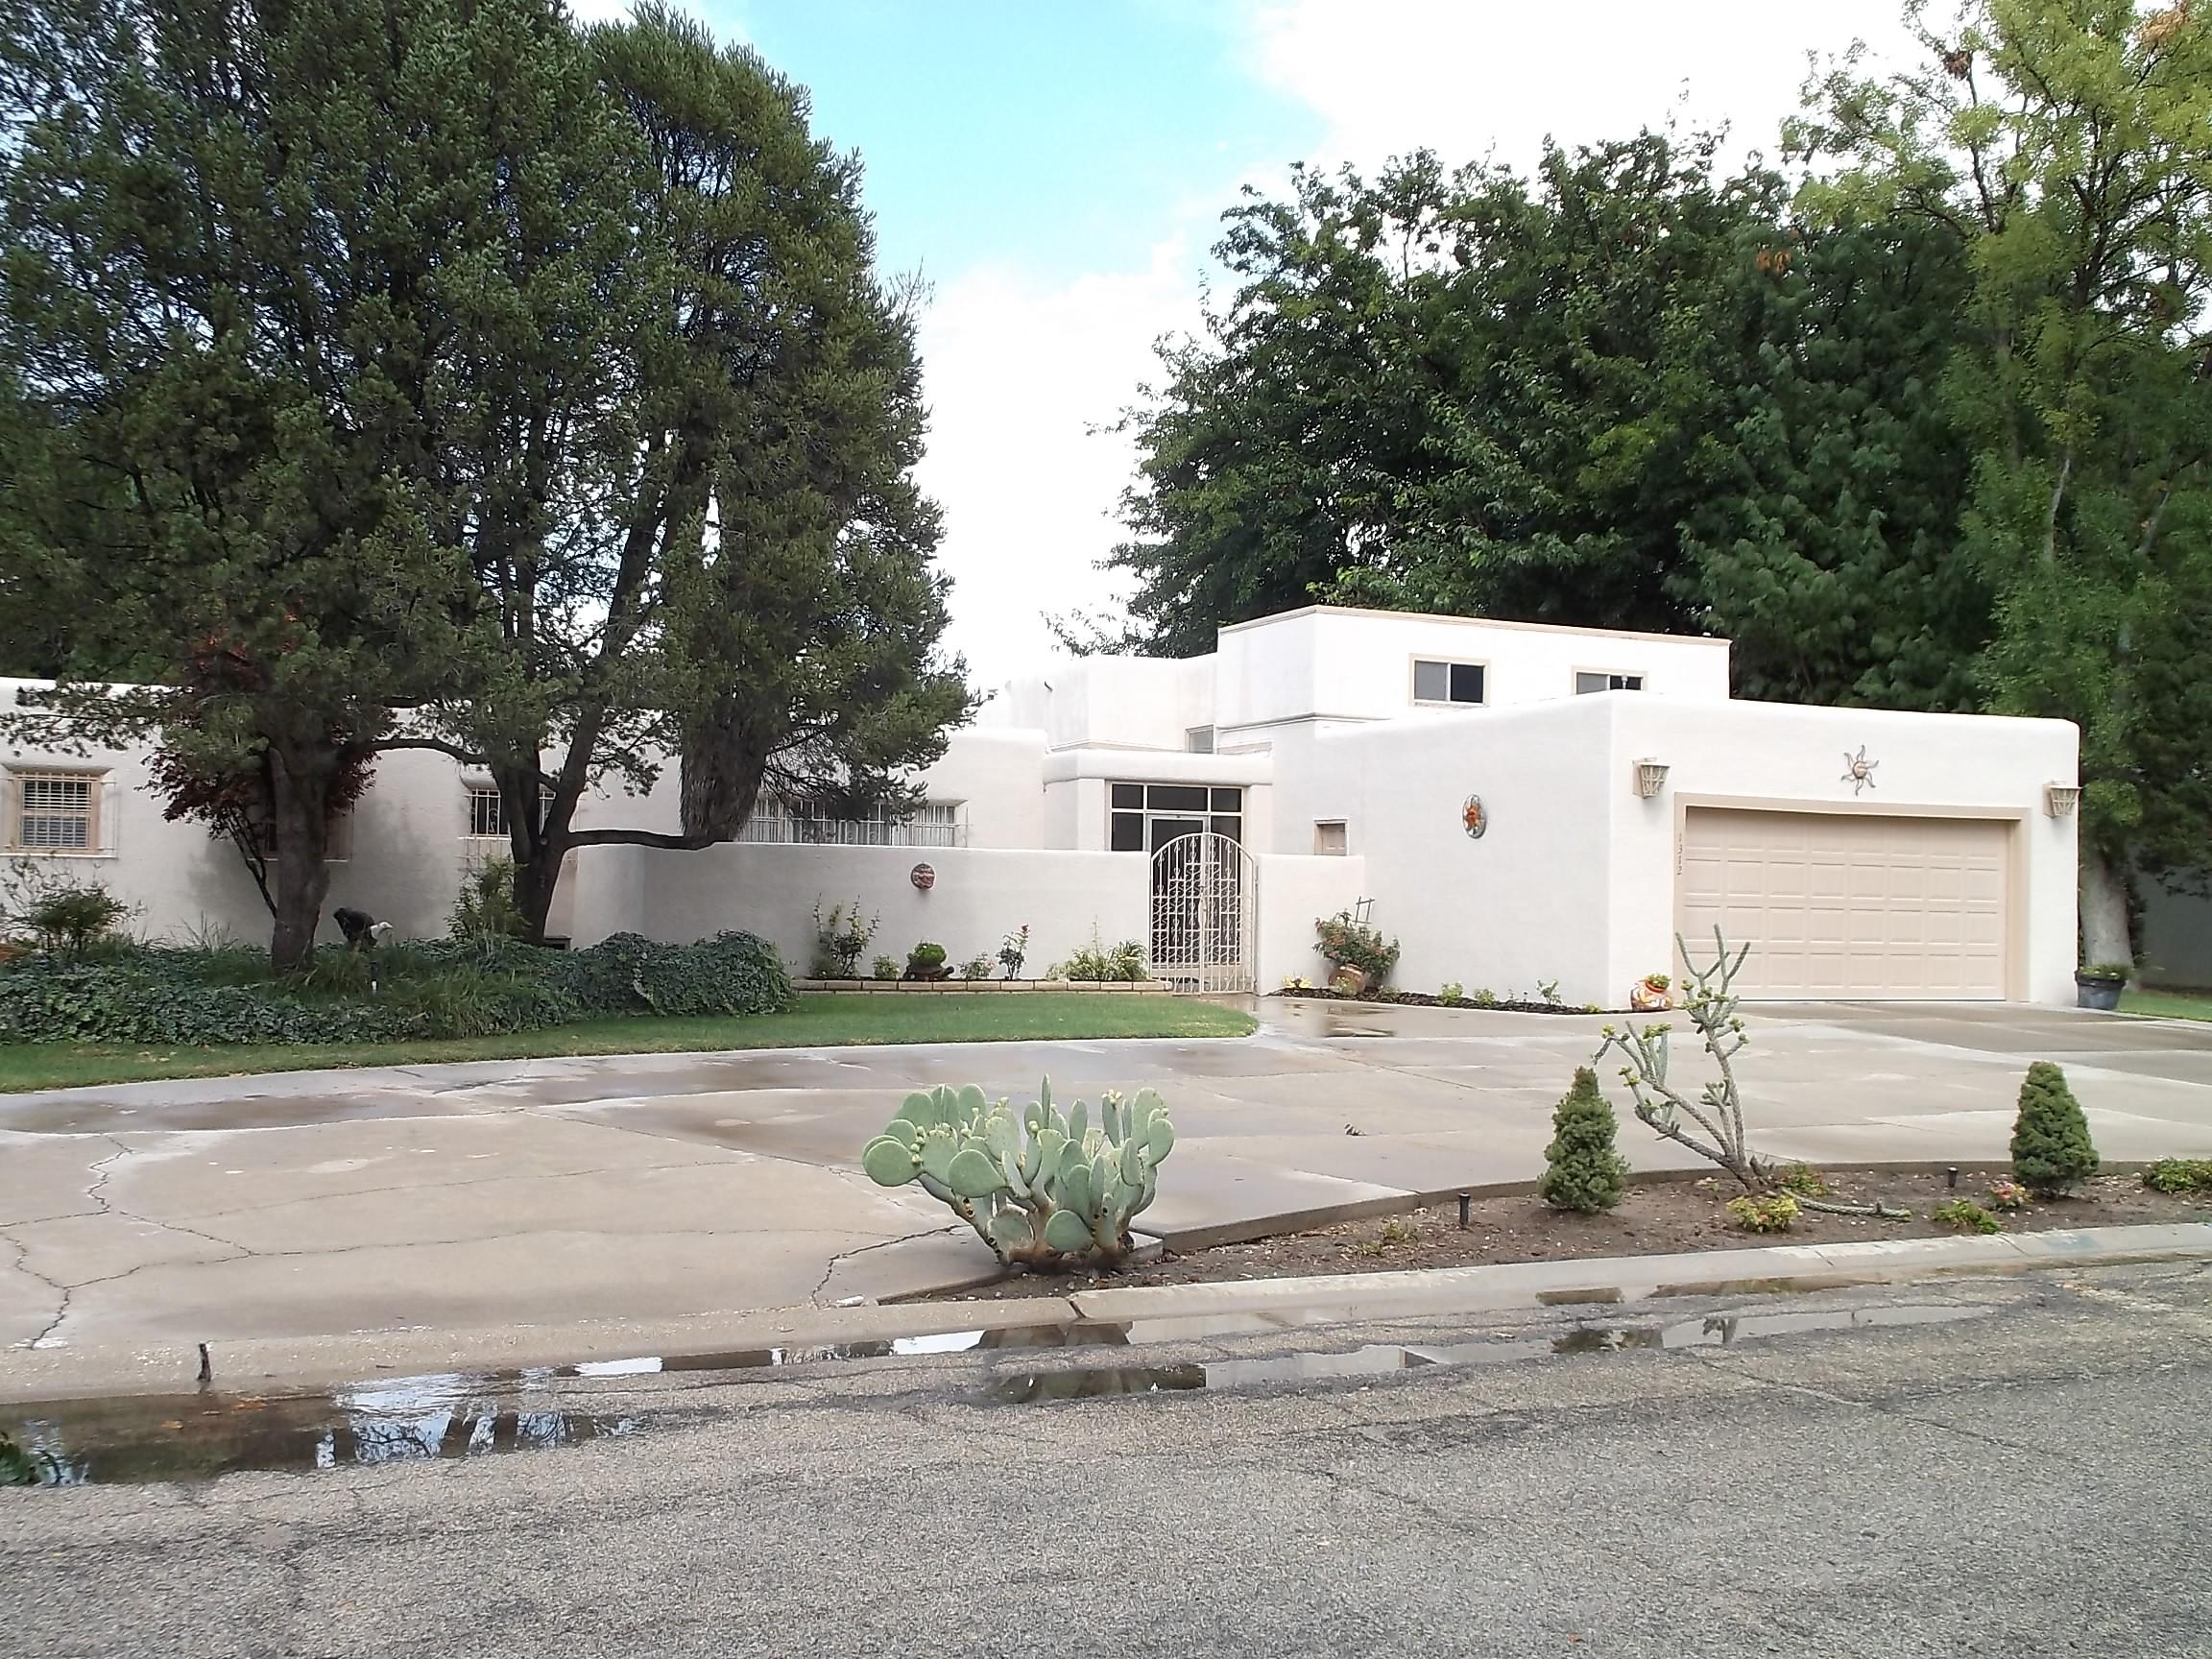 1312 Doepp Dr, Carlsbad, New Mexico 88220